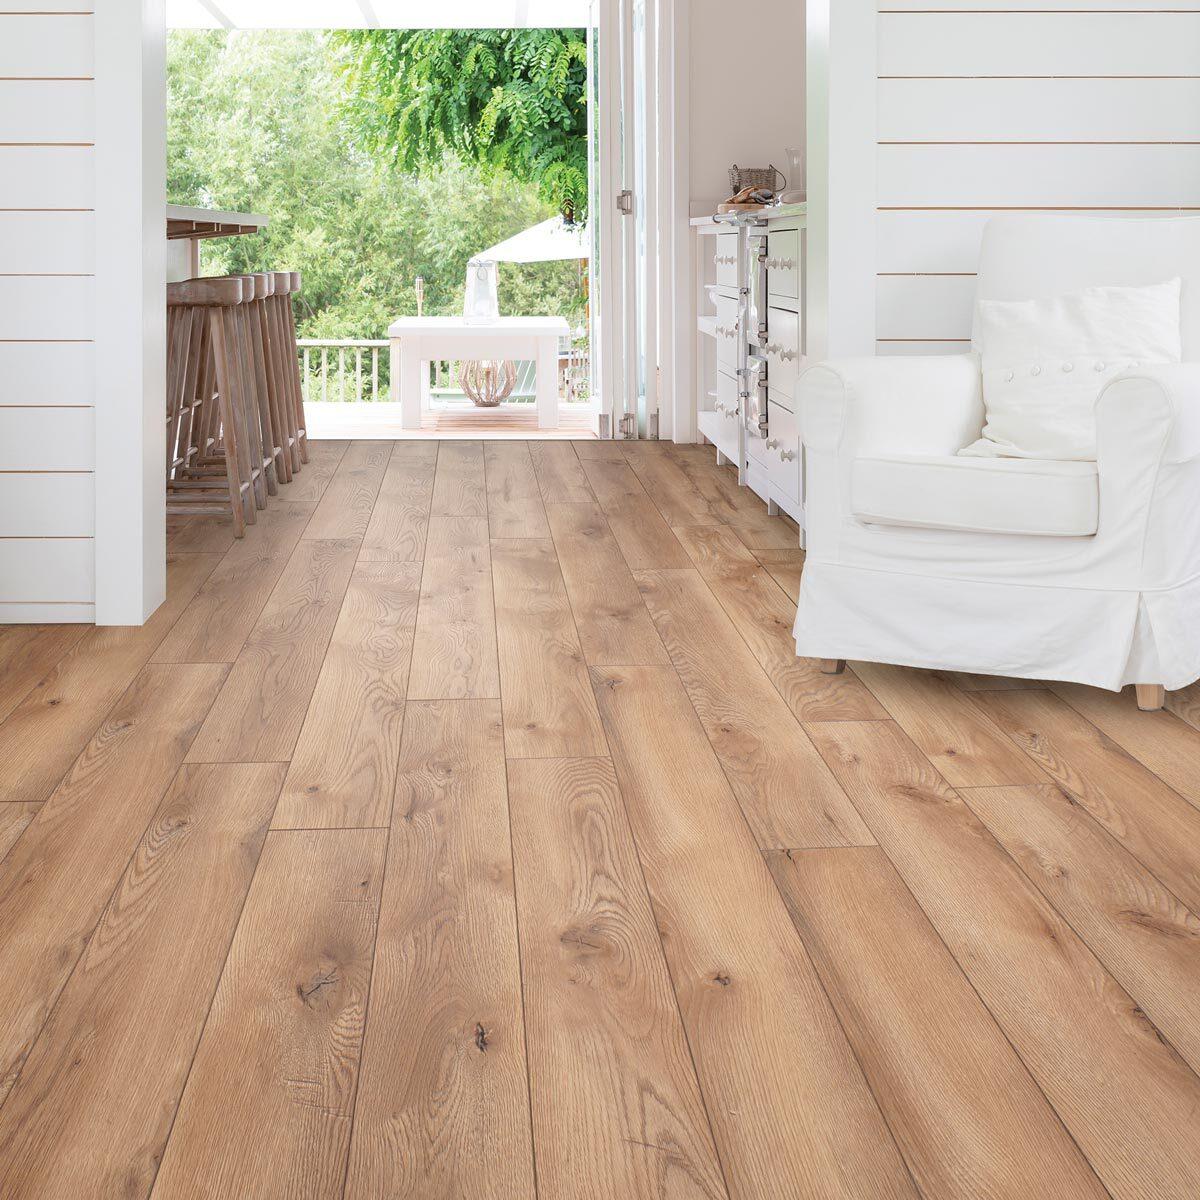 Ac5 Laminate Flooring, Woodland Oak Laminate Flooring